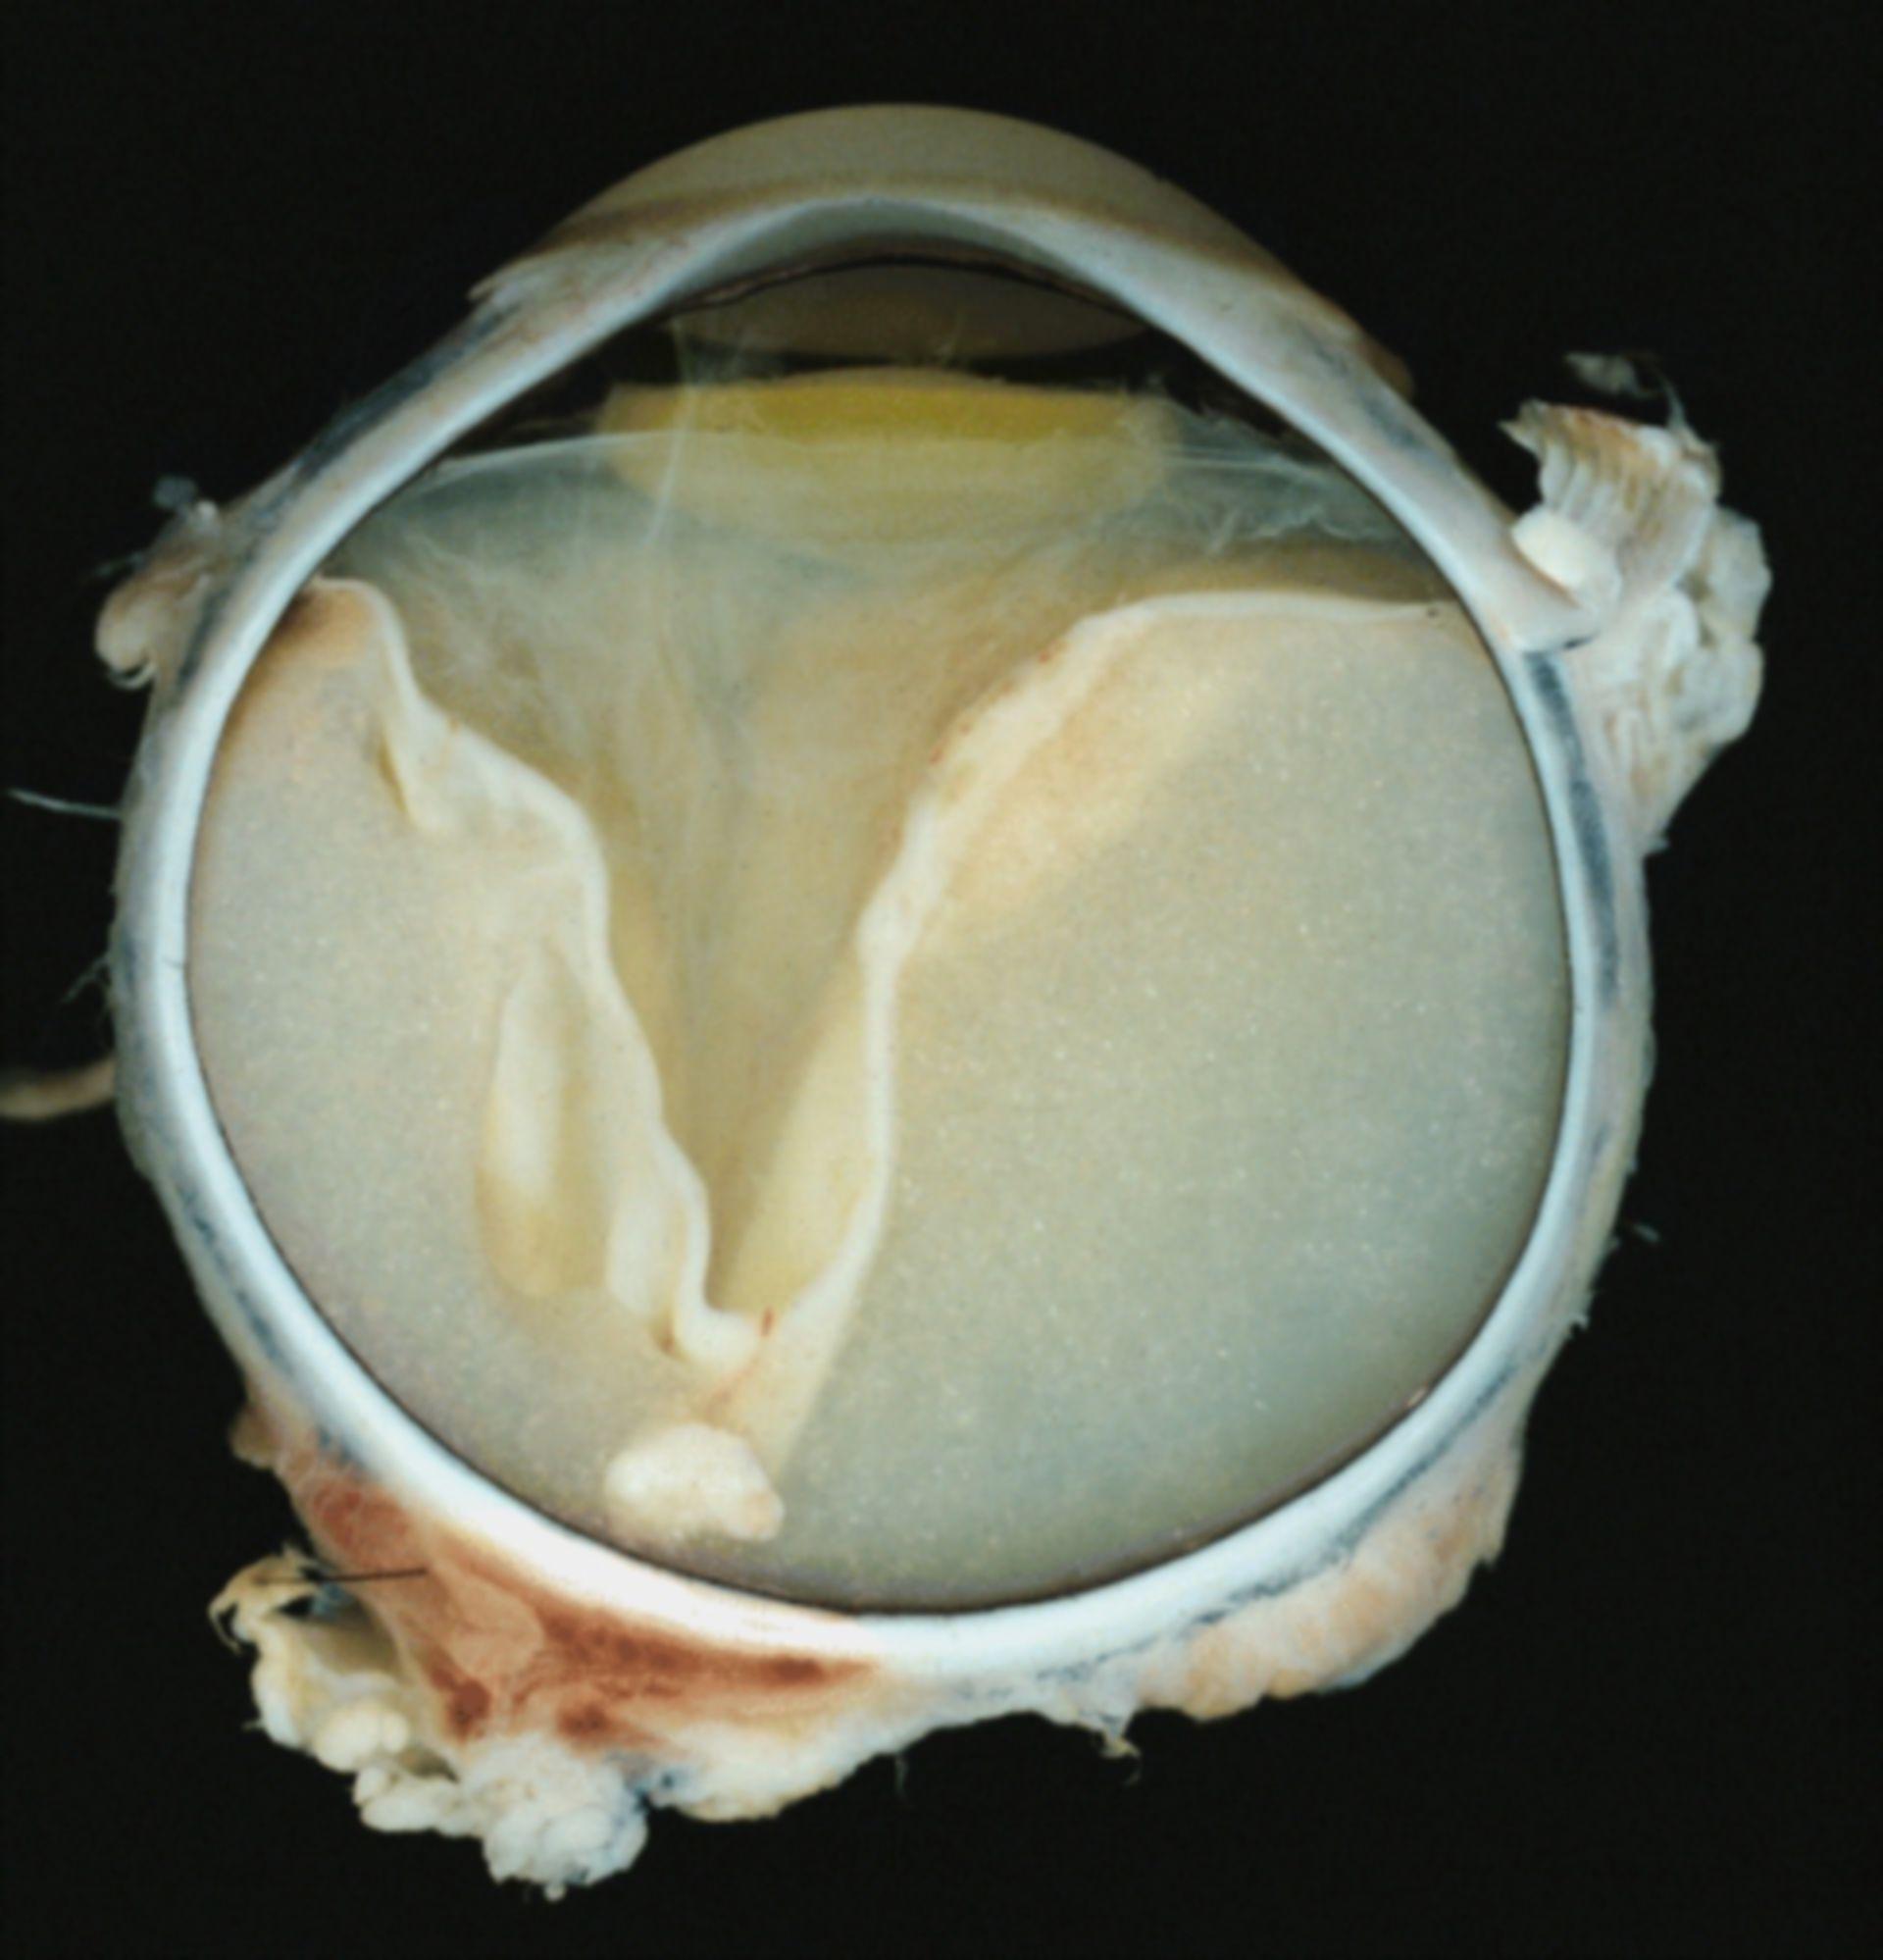 Coats' disease: Eye and Ocular Adnexa